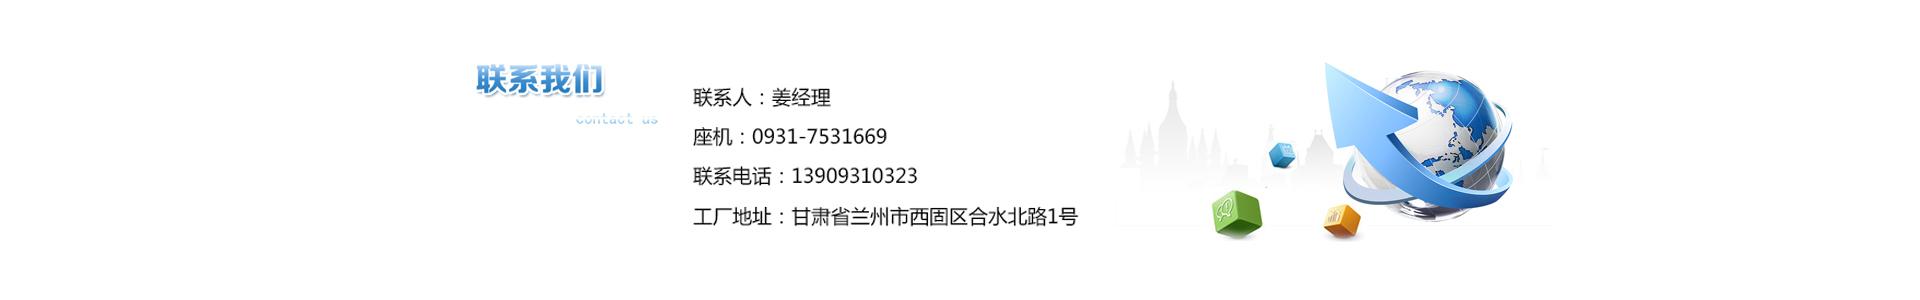 http://juhua454472.cn/Contact.html